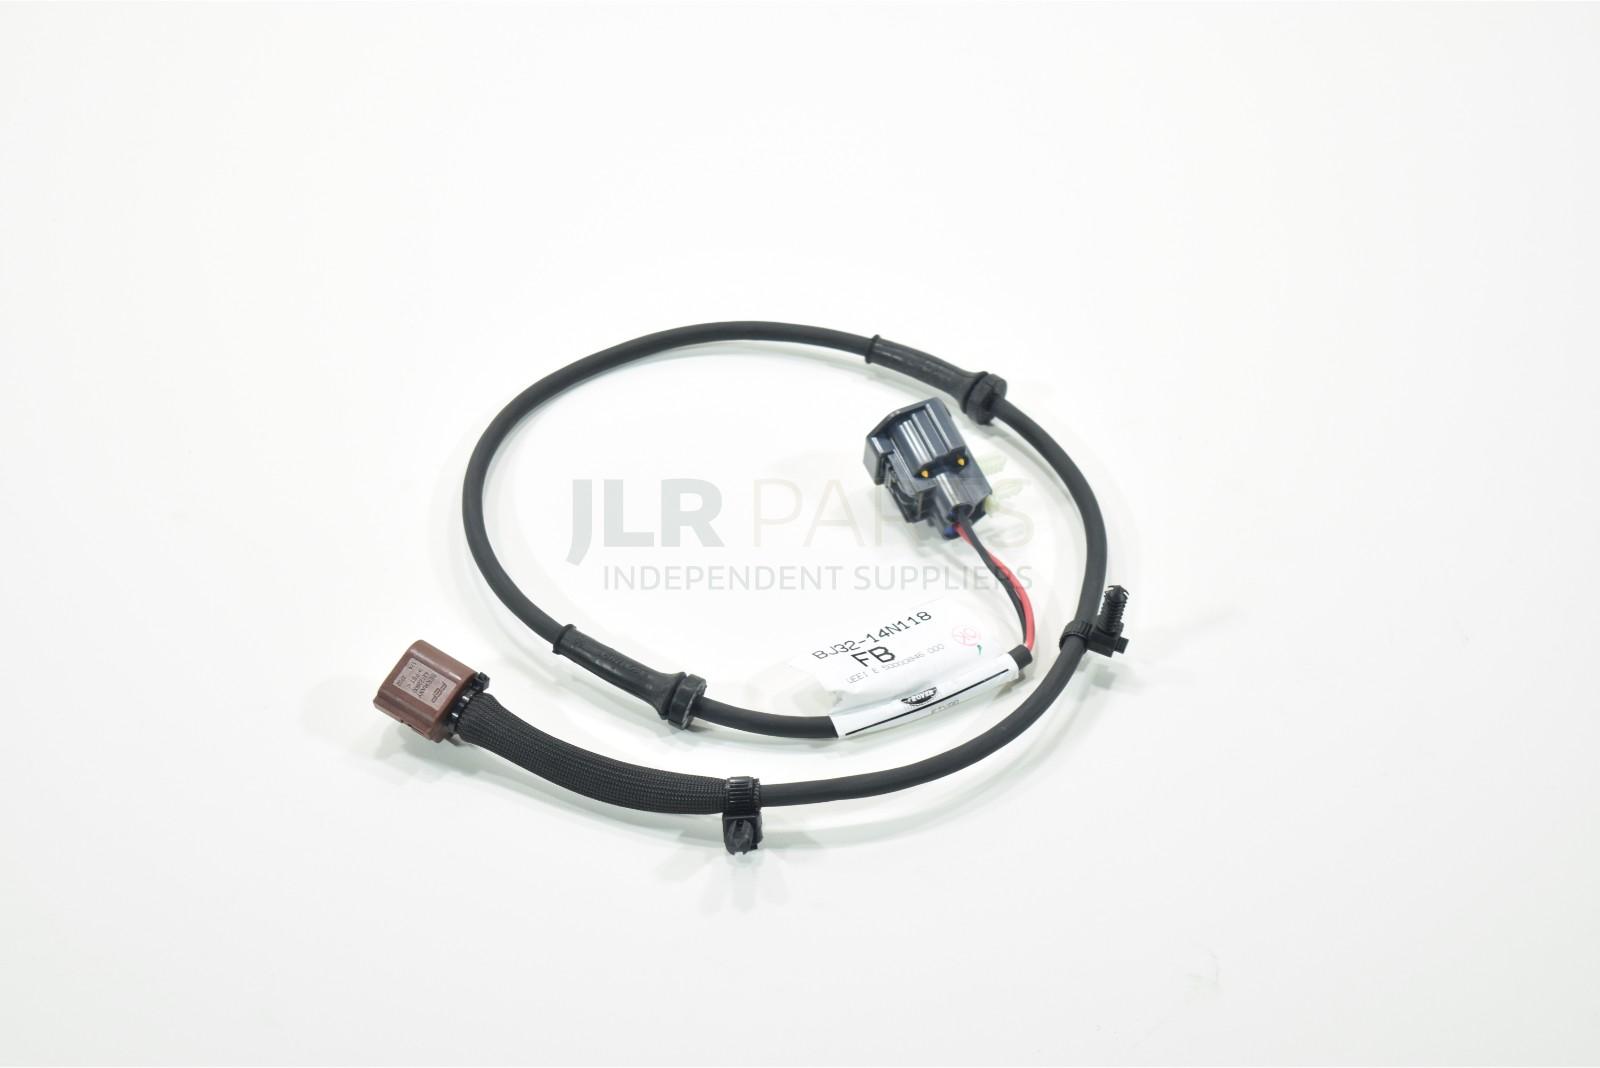 wiring diagrams#alternator wiring diagram#v12 jaguar engine diagram#usb  to vga wiring diagram#jaguar engine diagram#1998 jeep cherokee stereo wiring